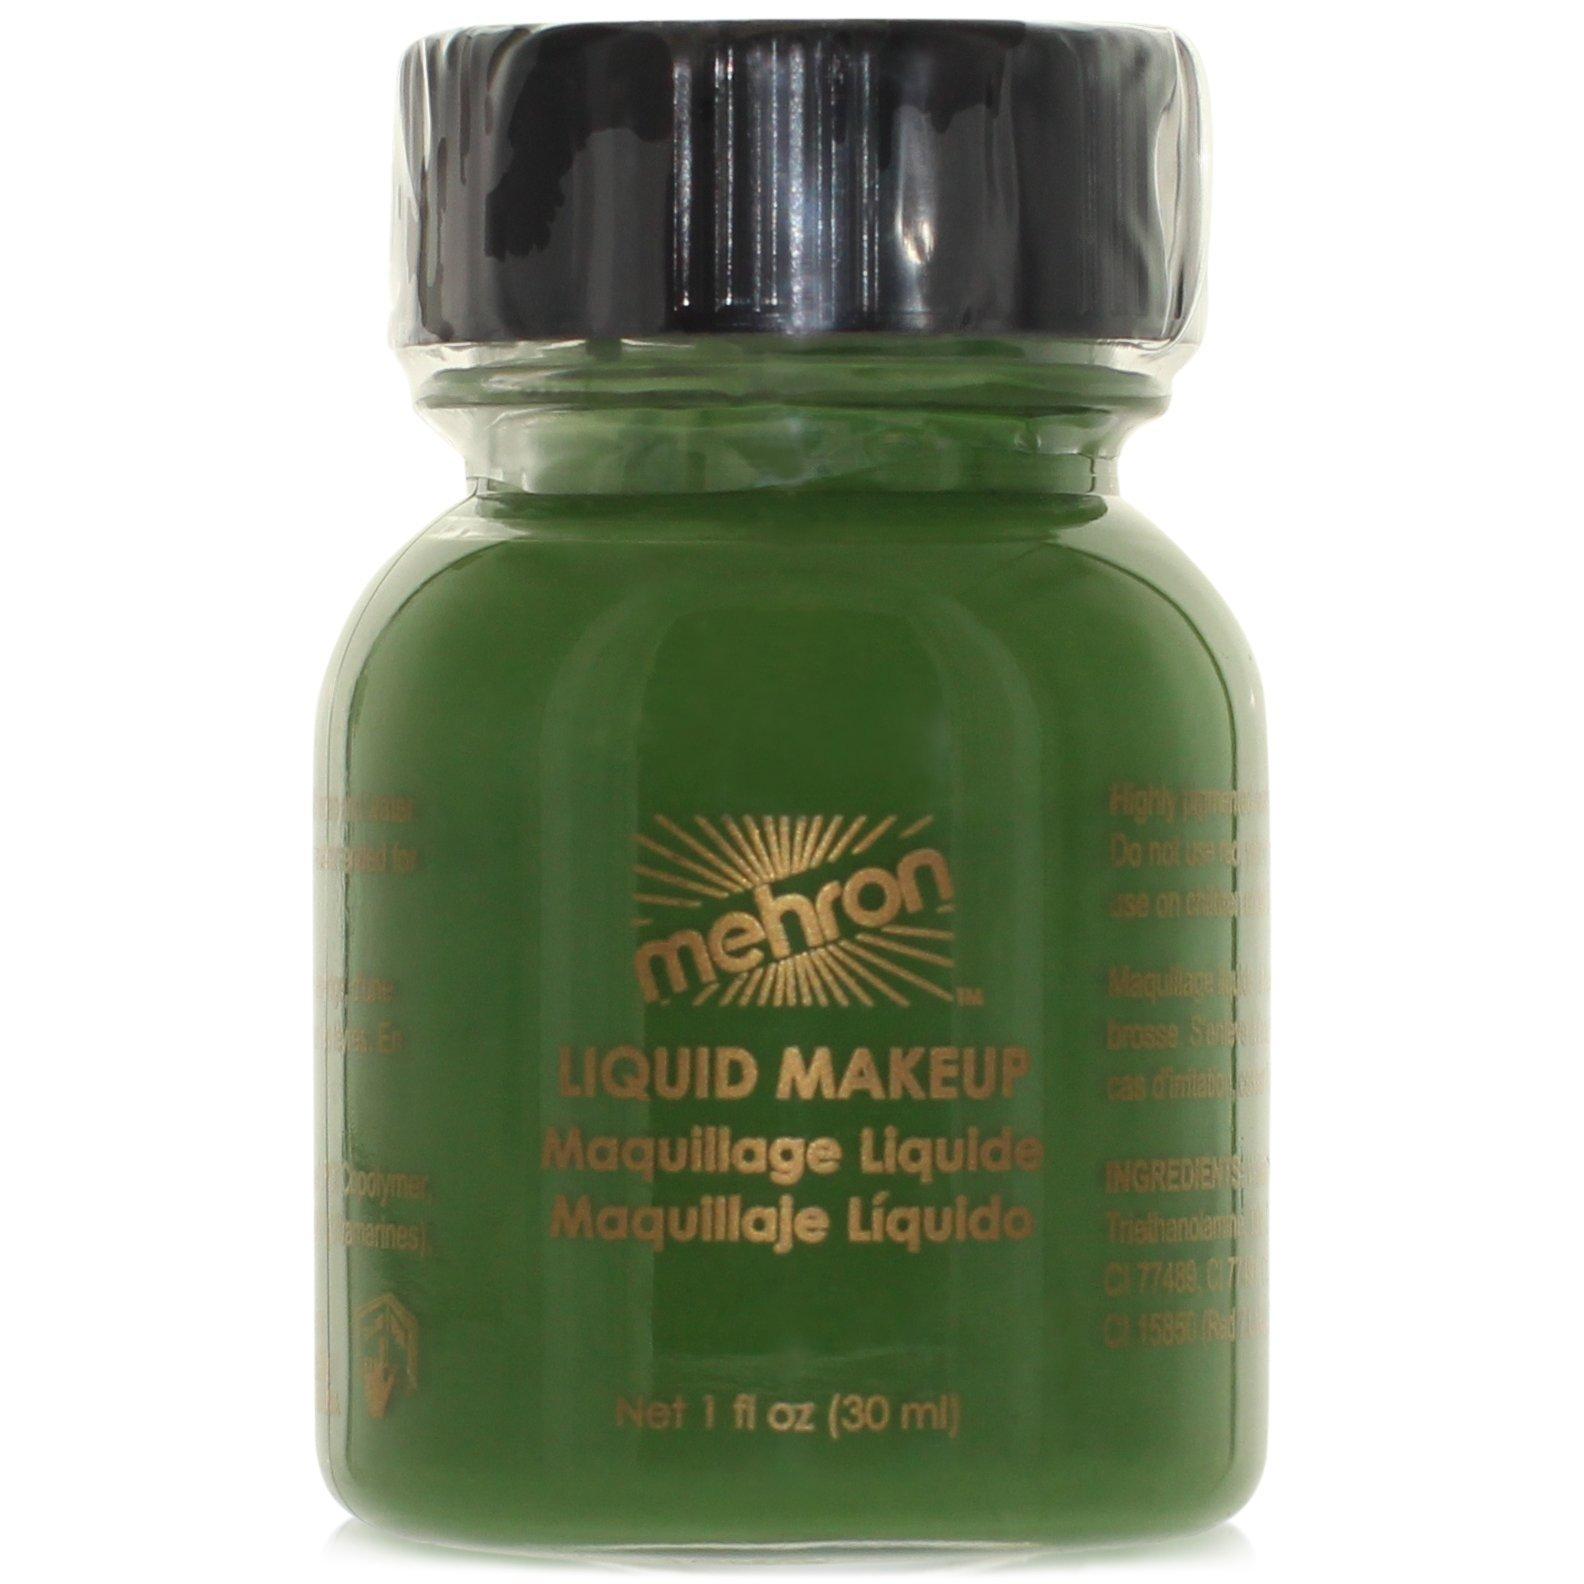 Mehron Makeup Liquid Face and Body Paint (1 oz) (GREEN)